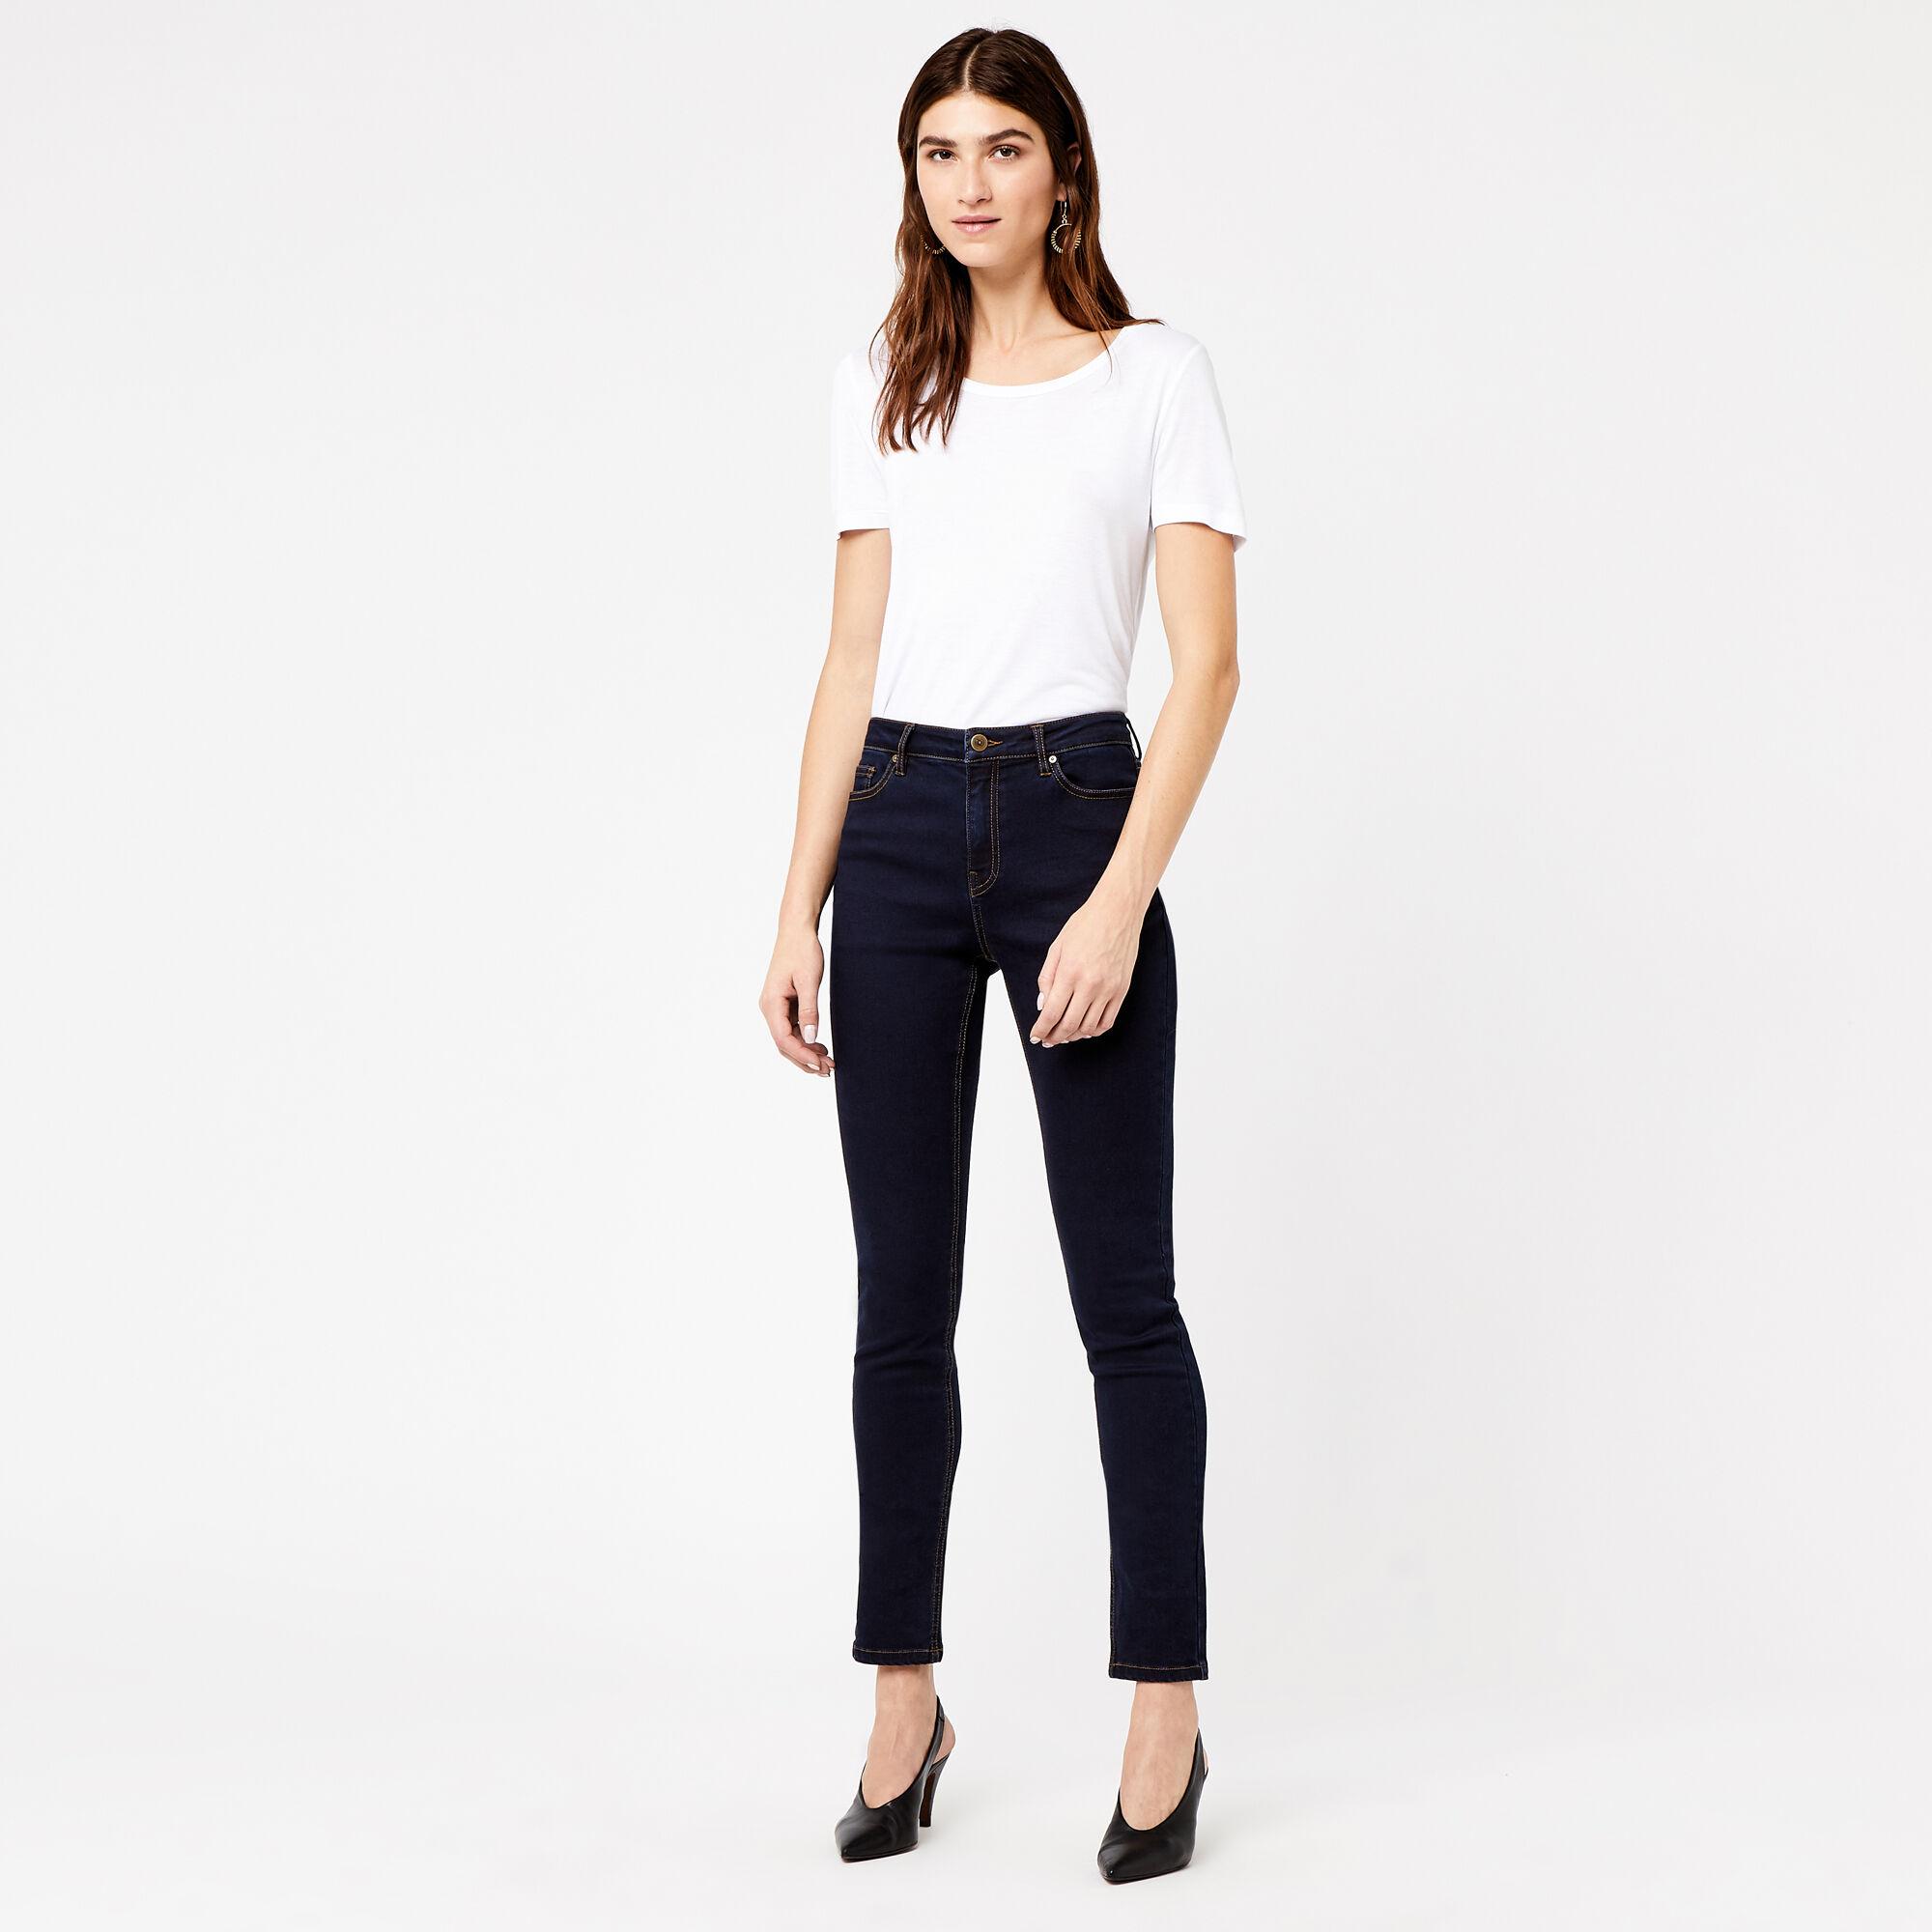 Warehouse, Powerhold Skinny Cut Jeans Dark Wash Denim 1